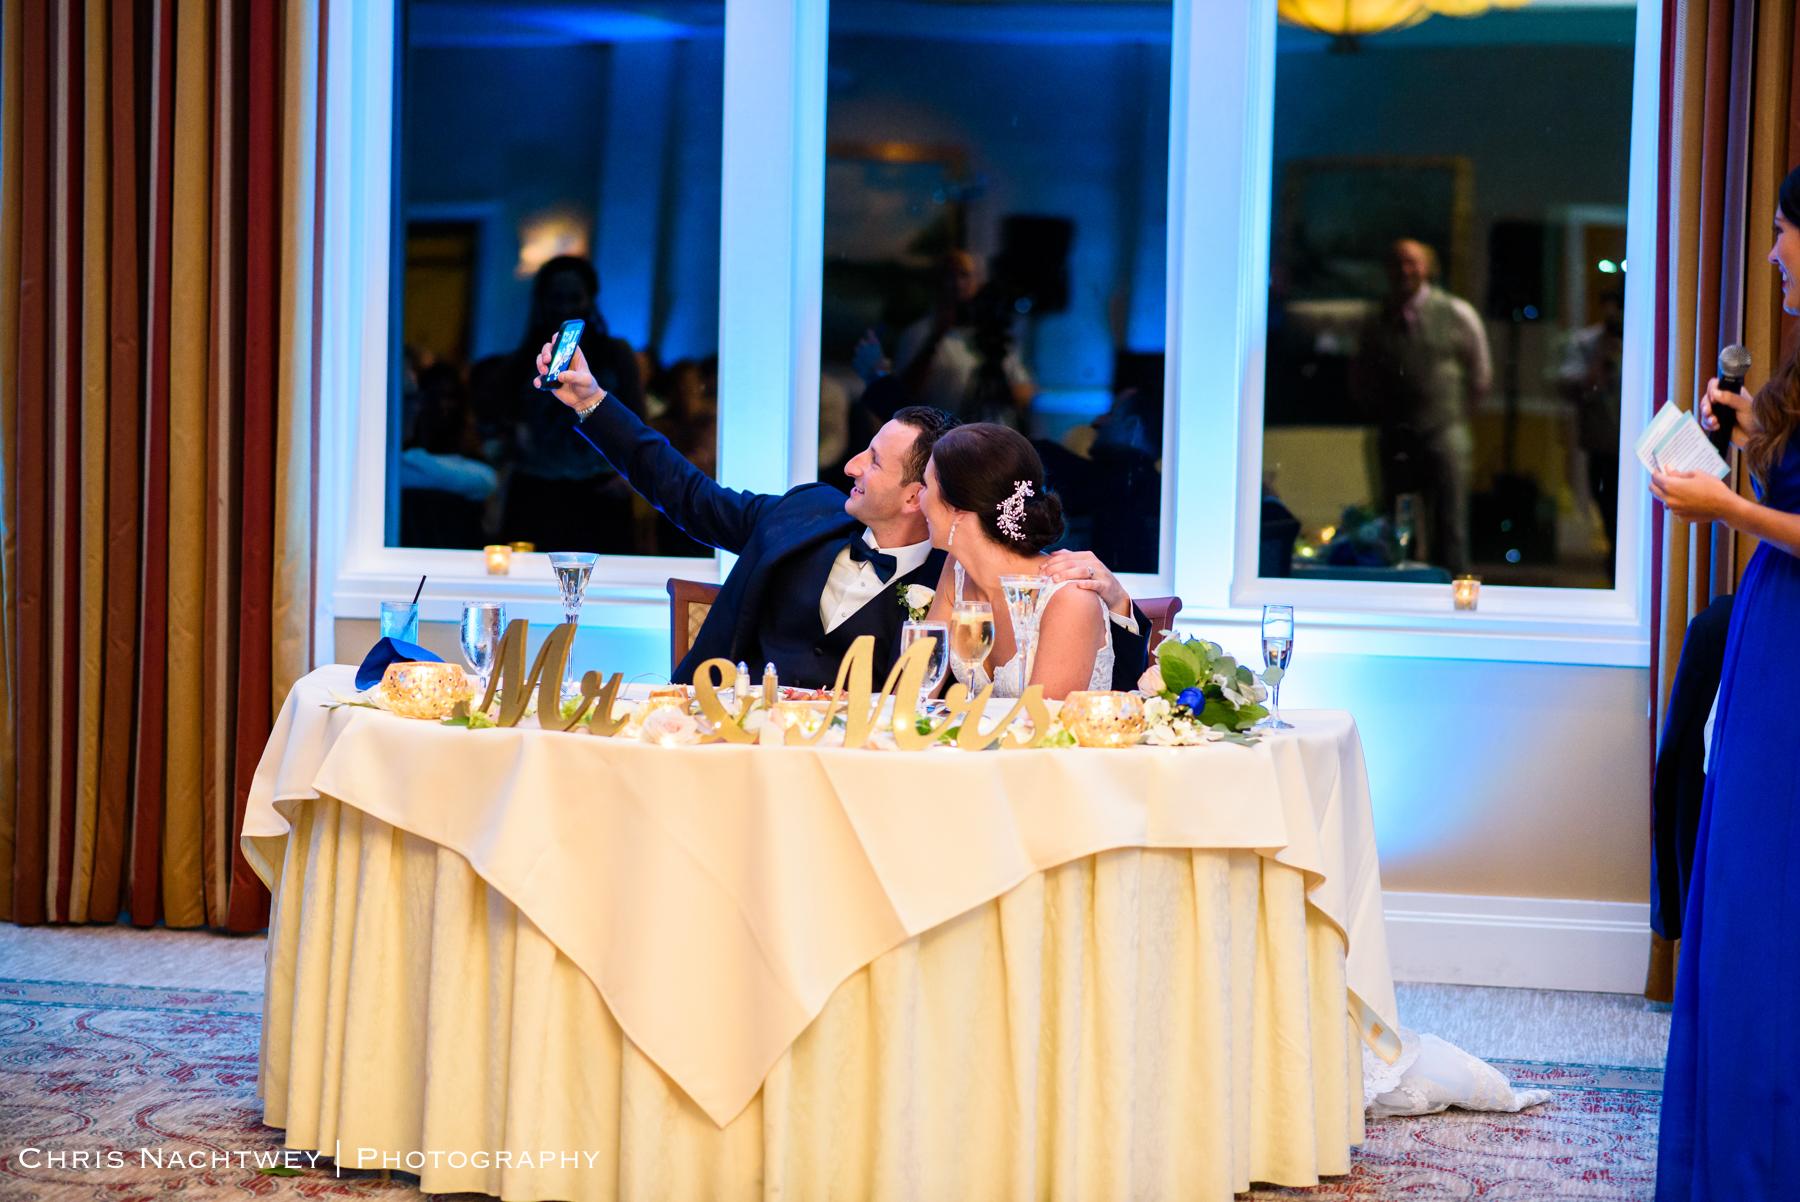 wedding-lake-of-isles-photos-chris-nachtwey-photography-2019-61.jpg